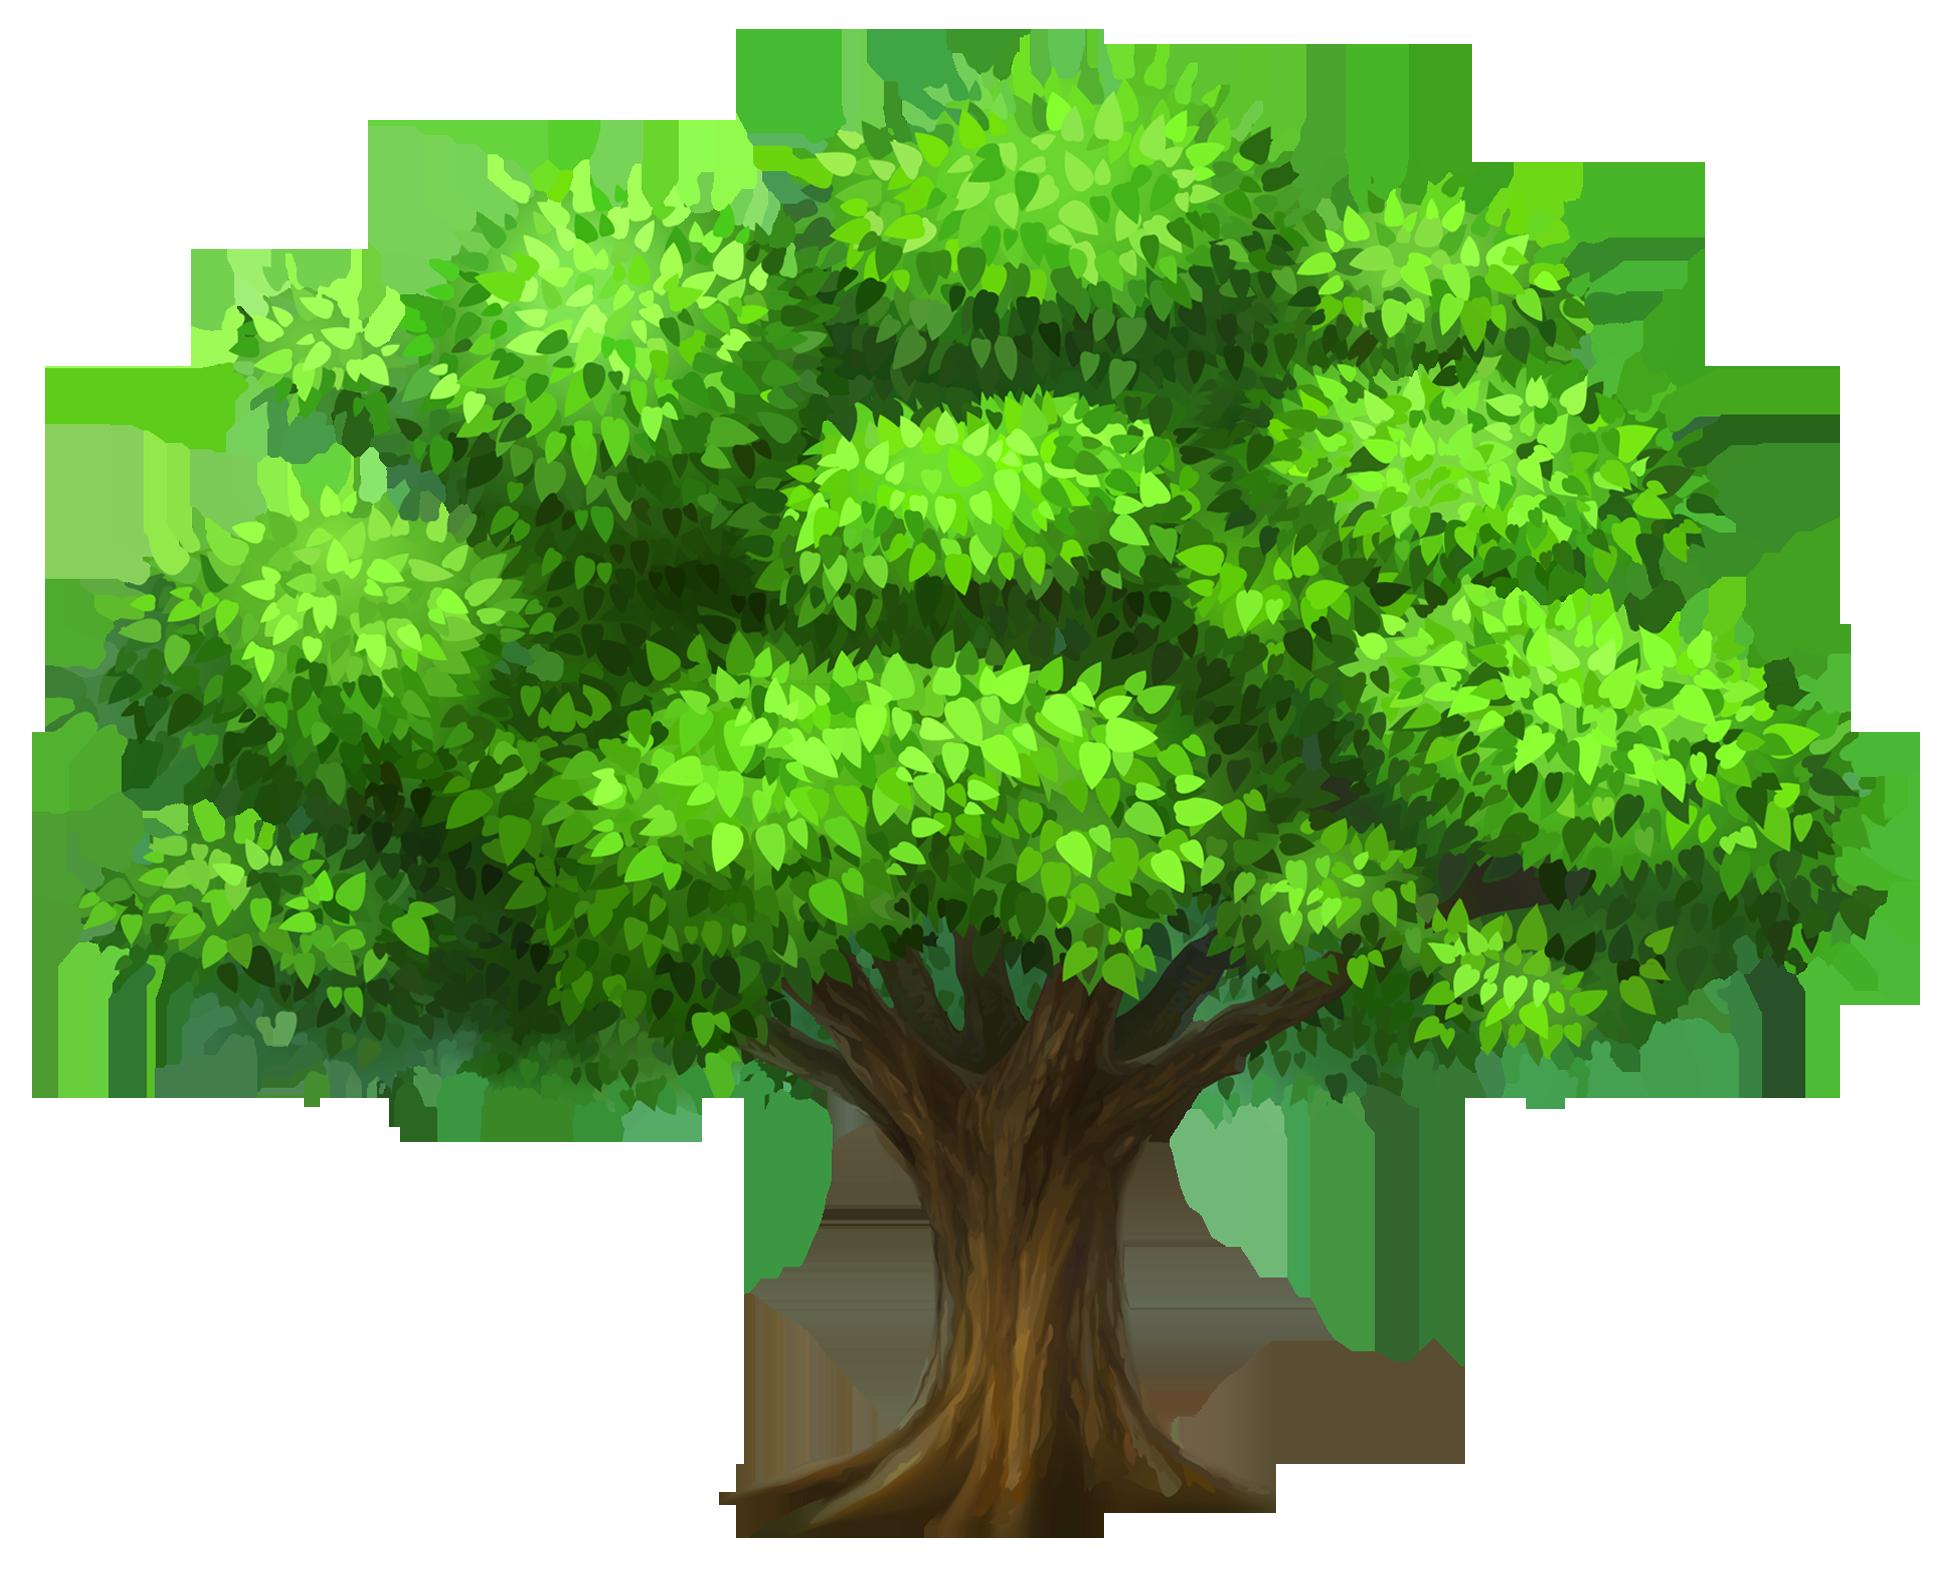 Tree hugger tree.